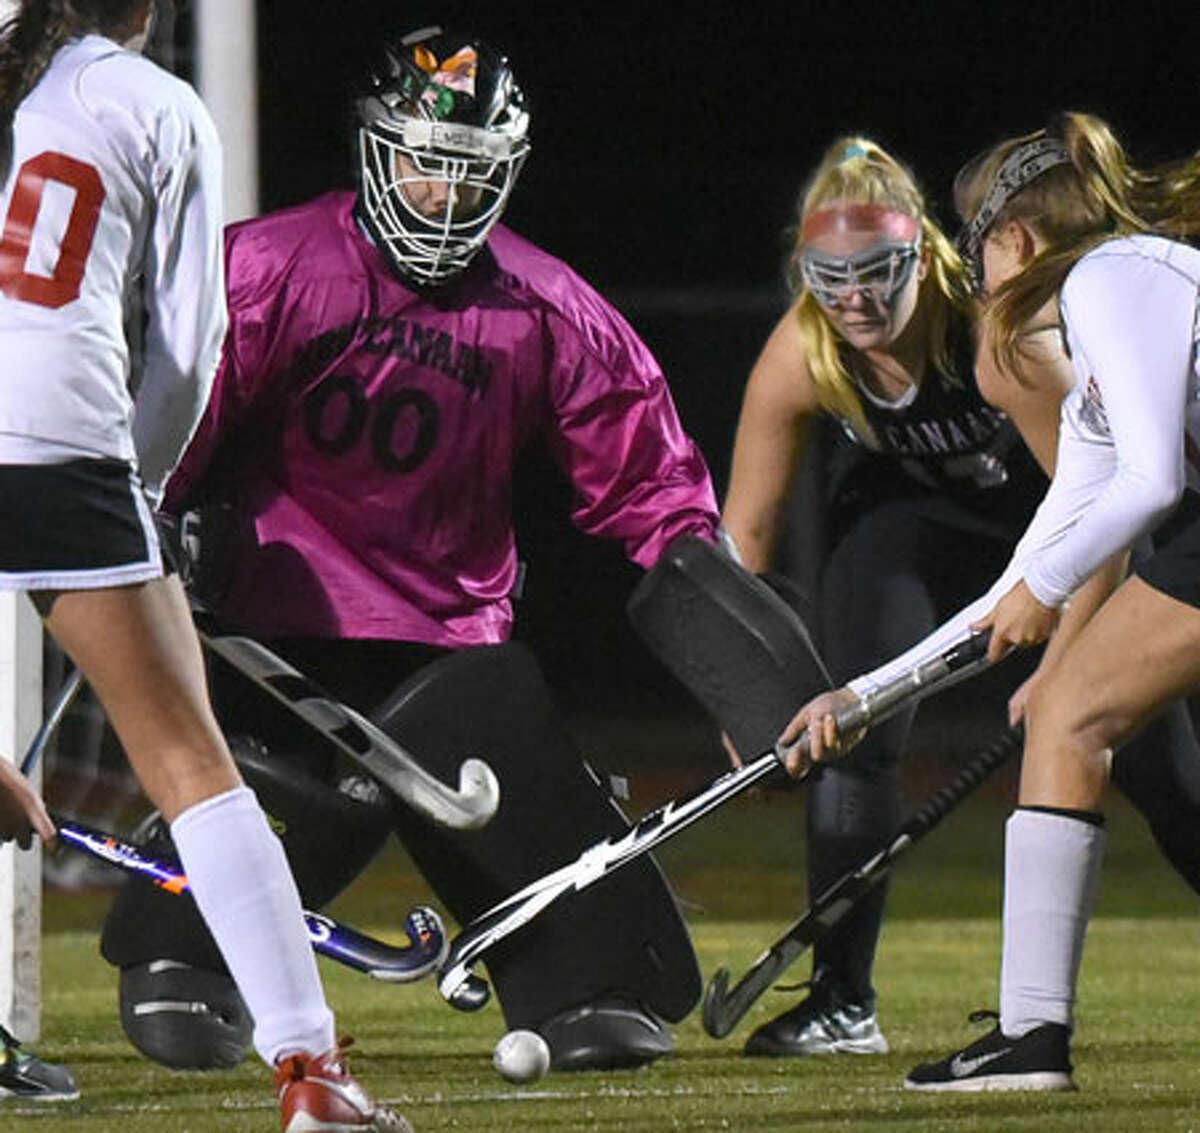 Goalie Emily Gaeta, a senior co-captain this fall, shuts down an opposing forward during the state tournament last year. - Dave Stewart photo